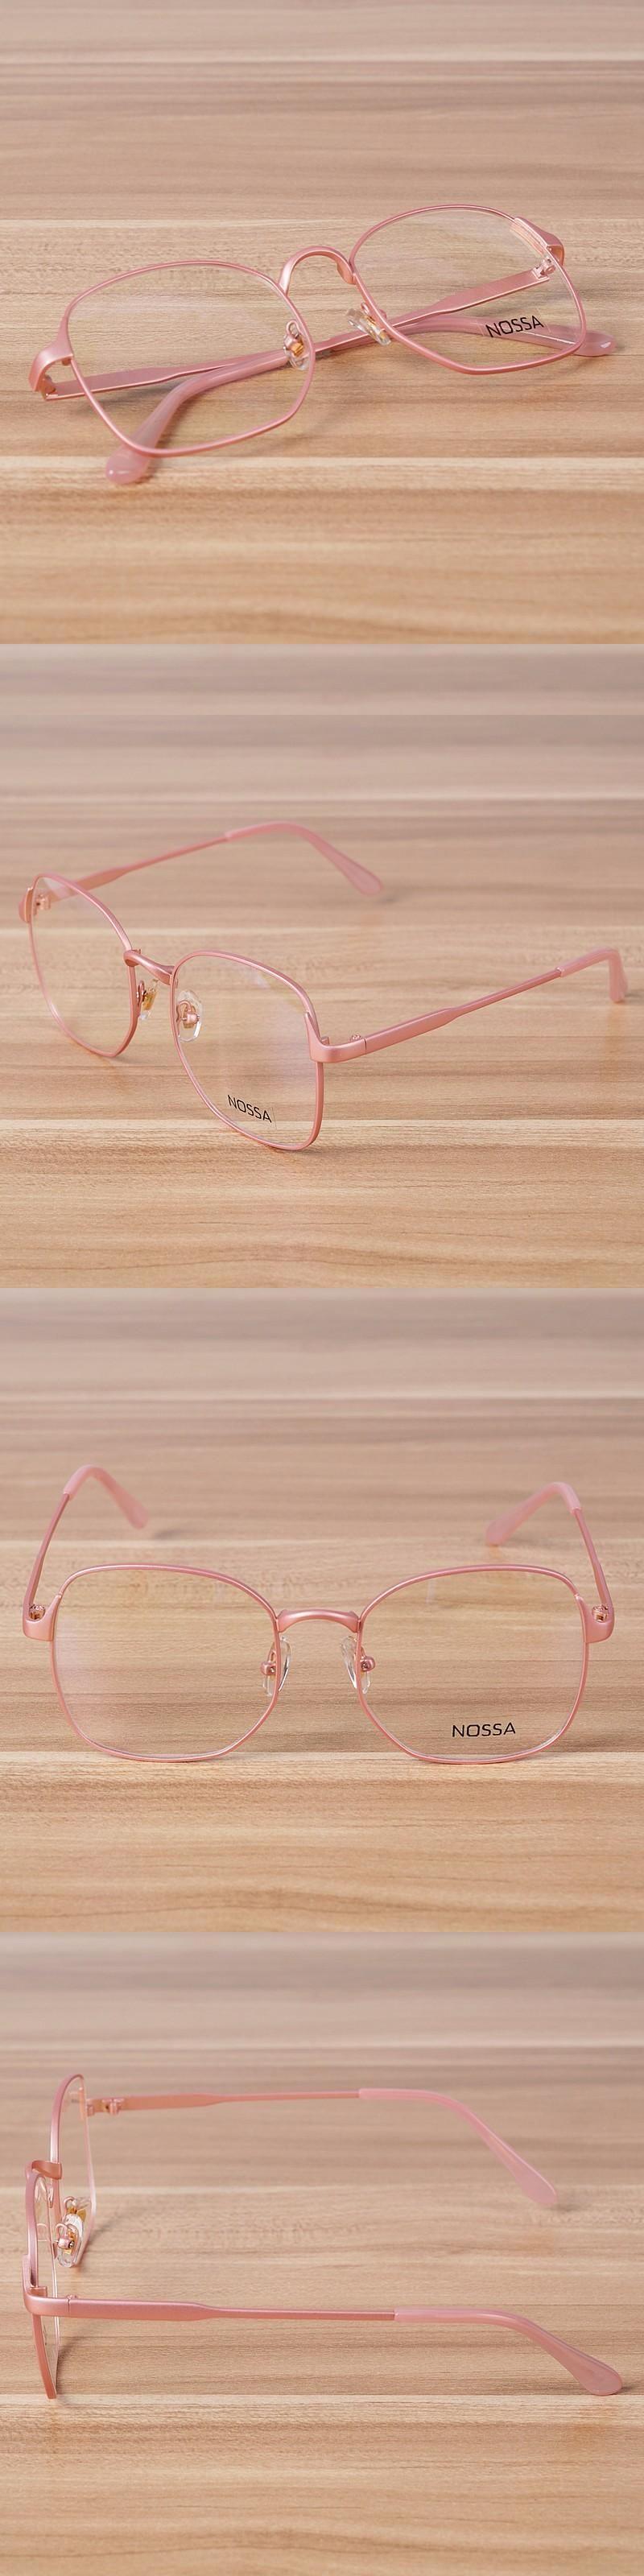 c0fcd2fde9f NOSSA Metal Big Frame Clear Glasses Women   Mens Pink Black Eyewear Female  Fashion Myopia Glasses